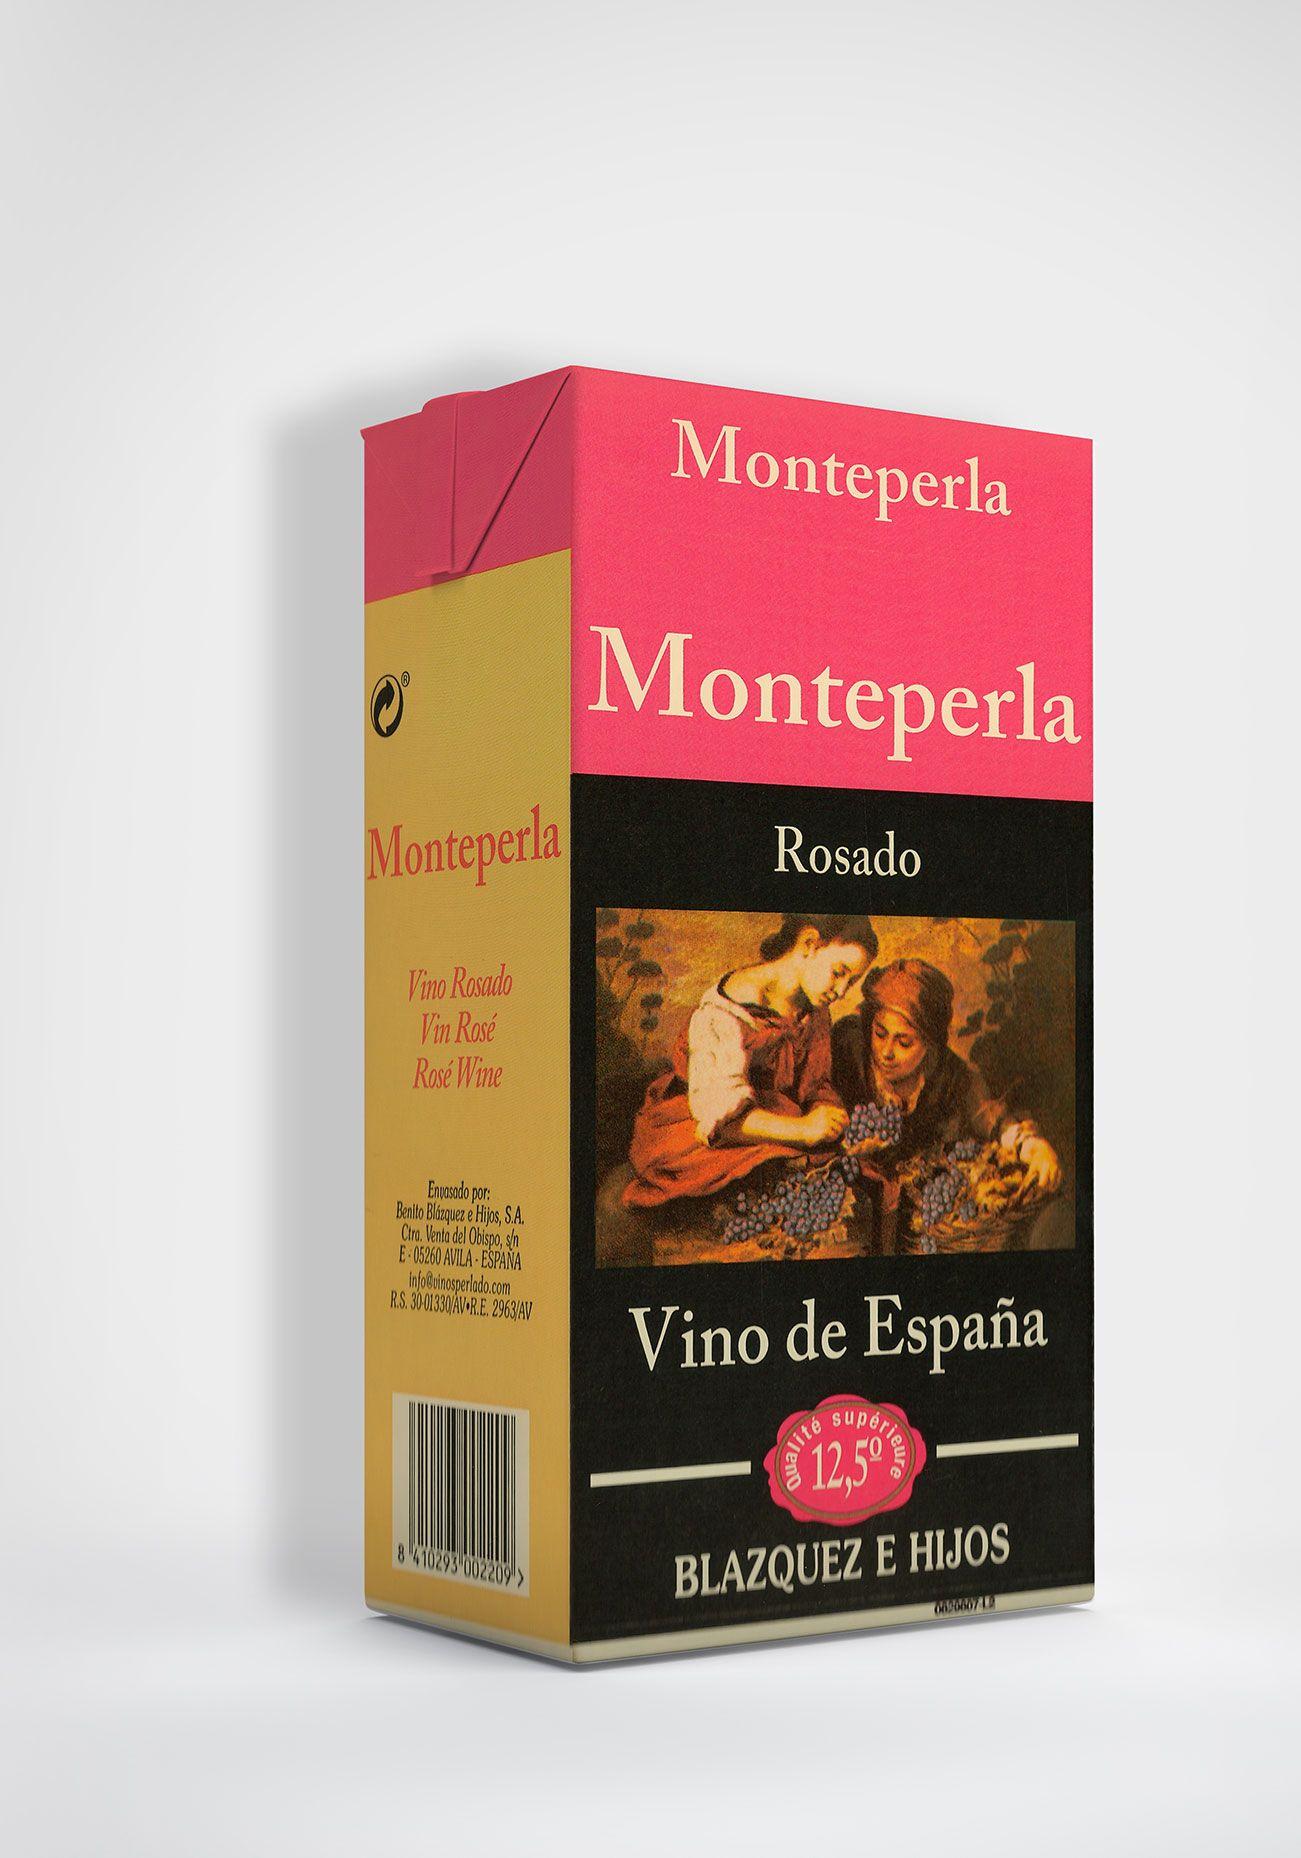 Benito Blázquez - Brik de Vino Monteperla Rosado